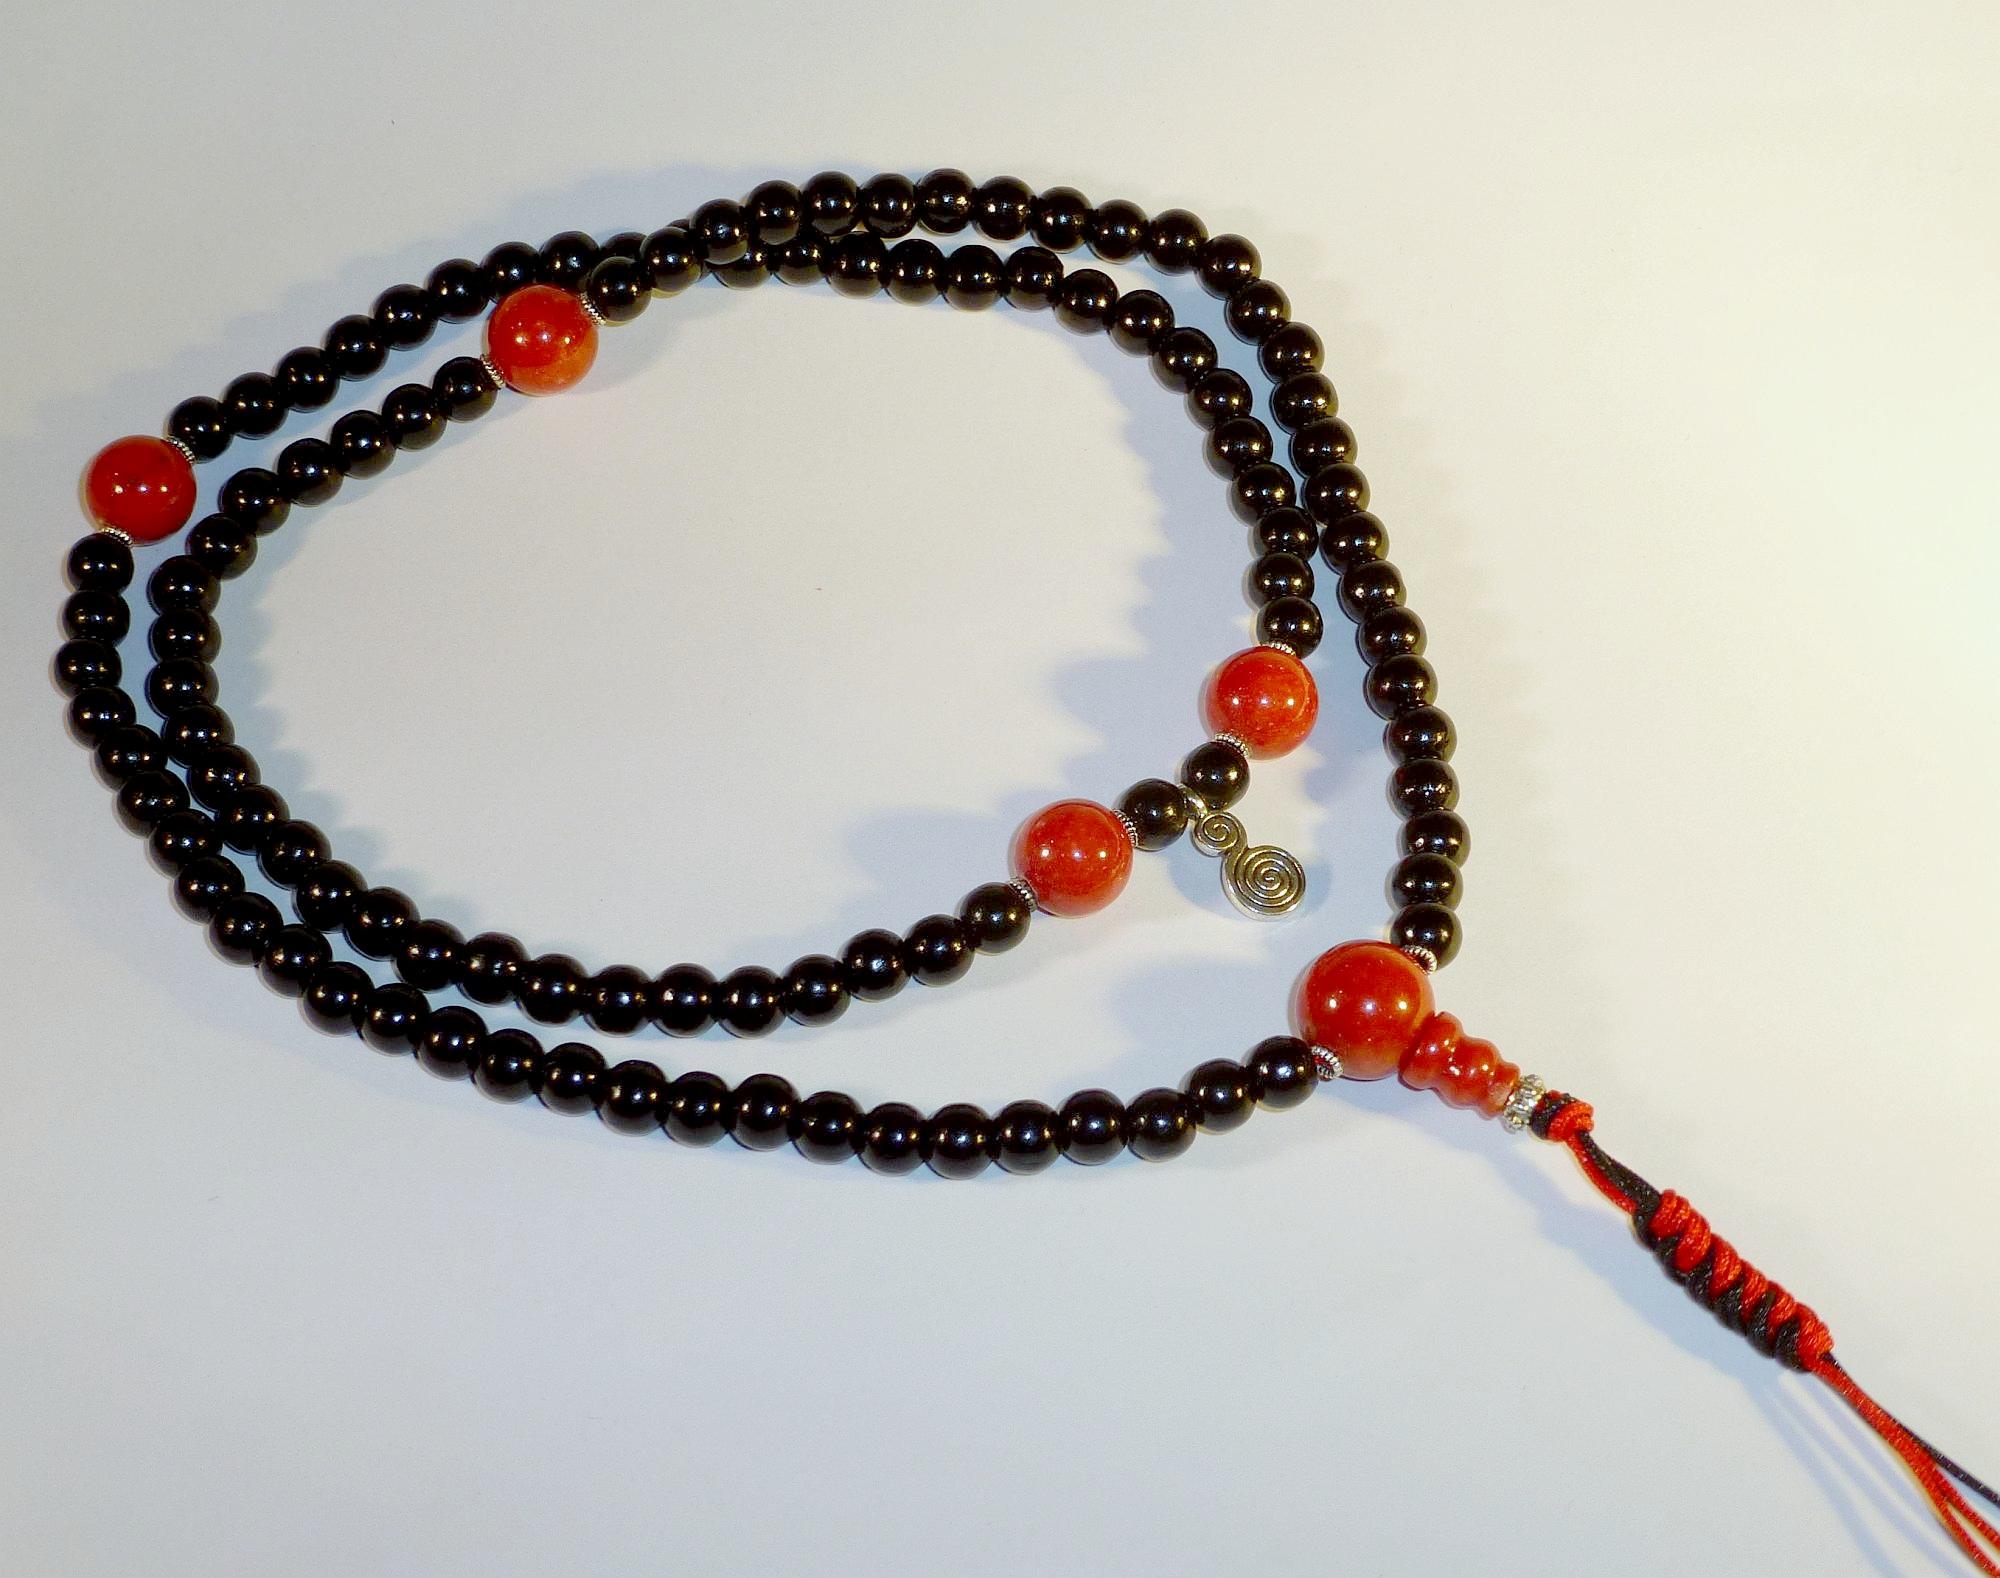 Mala-schwarz-rot-lang_ji